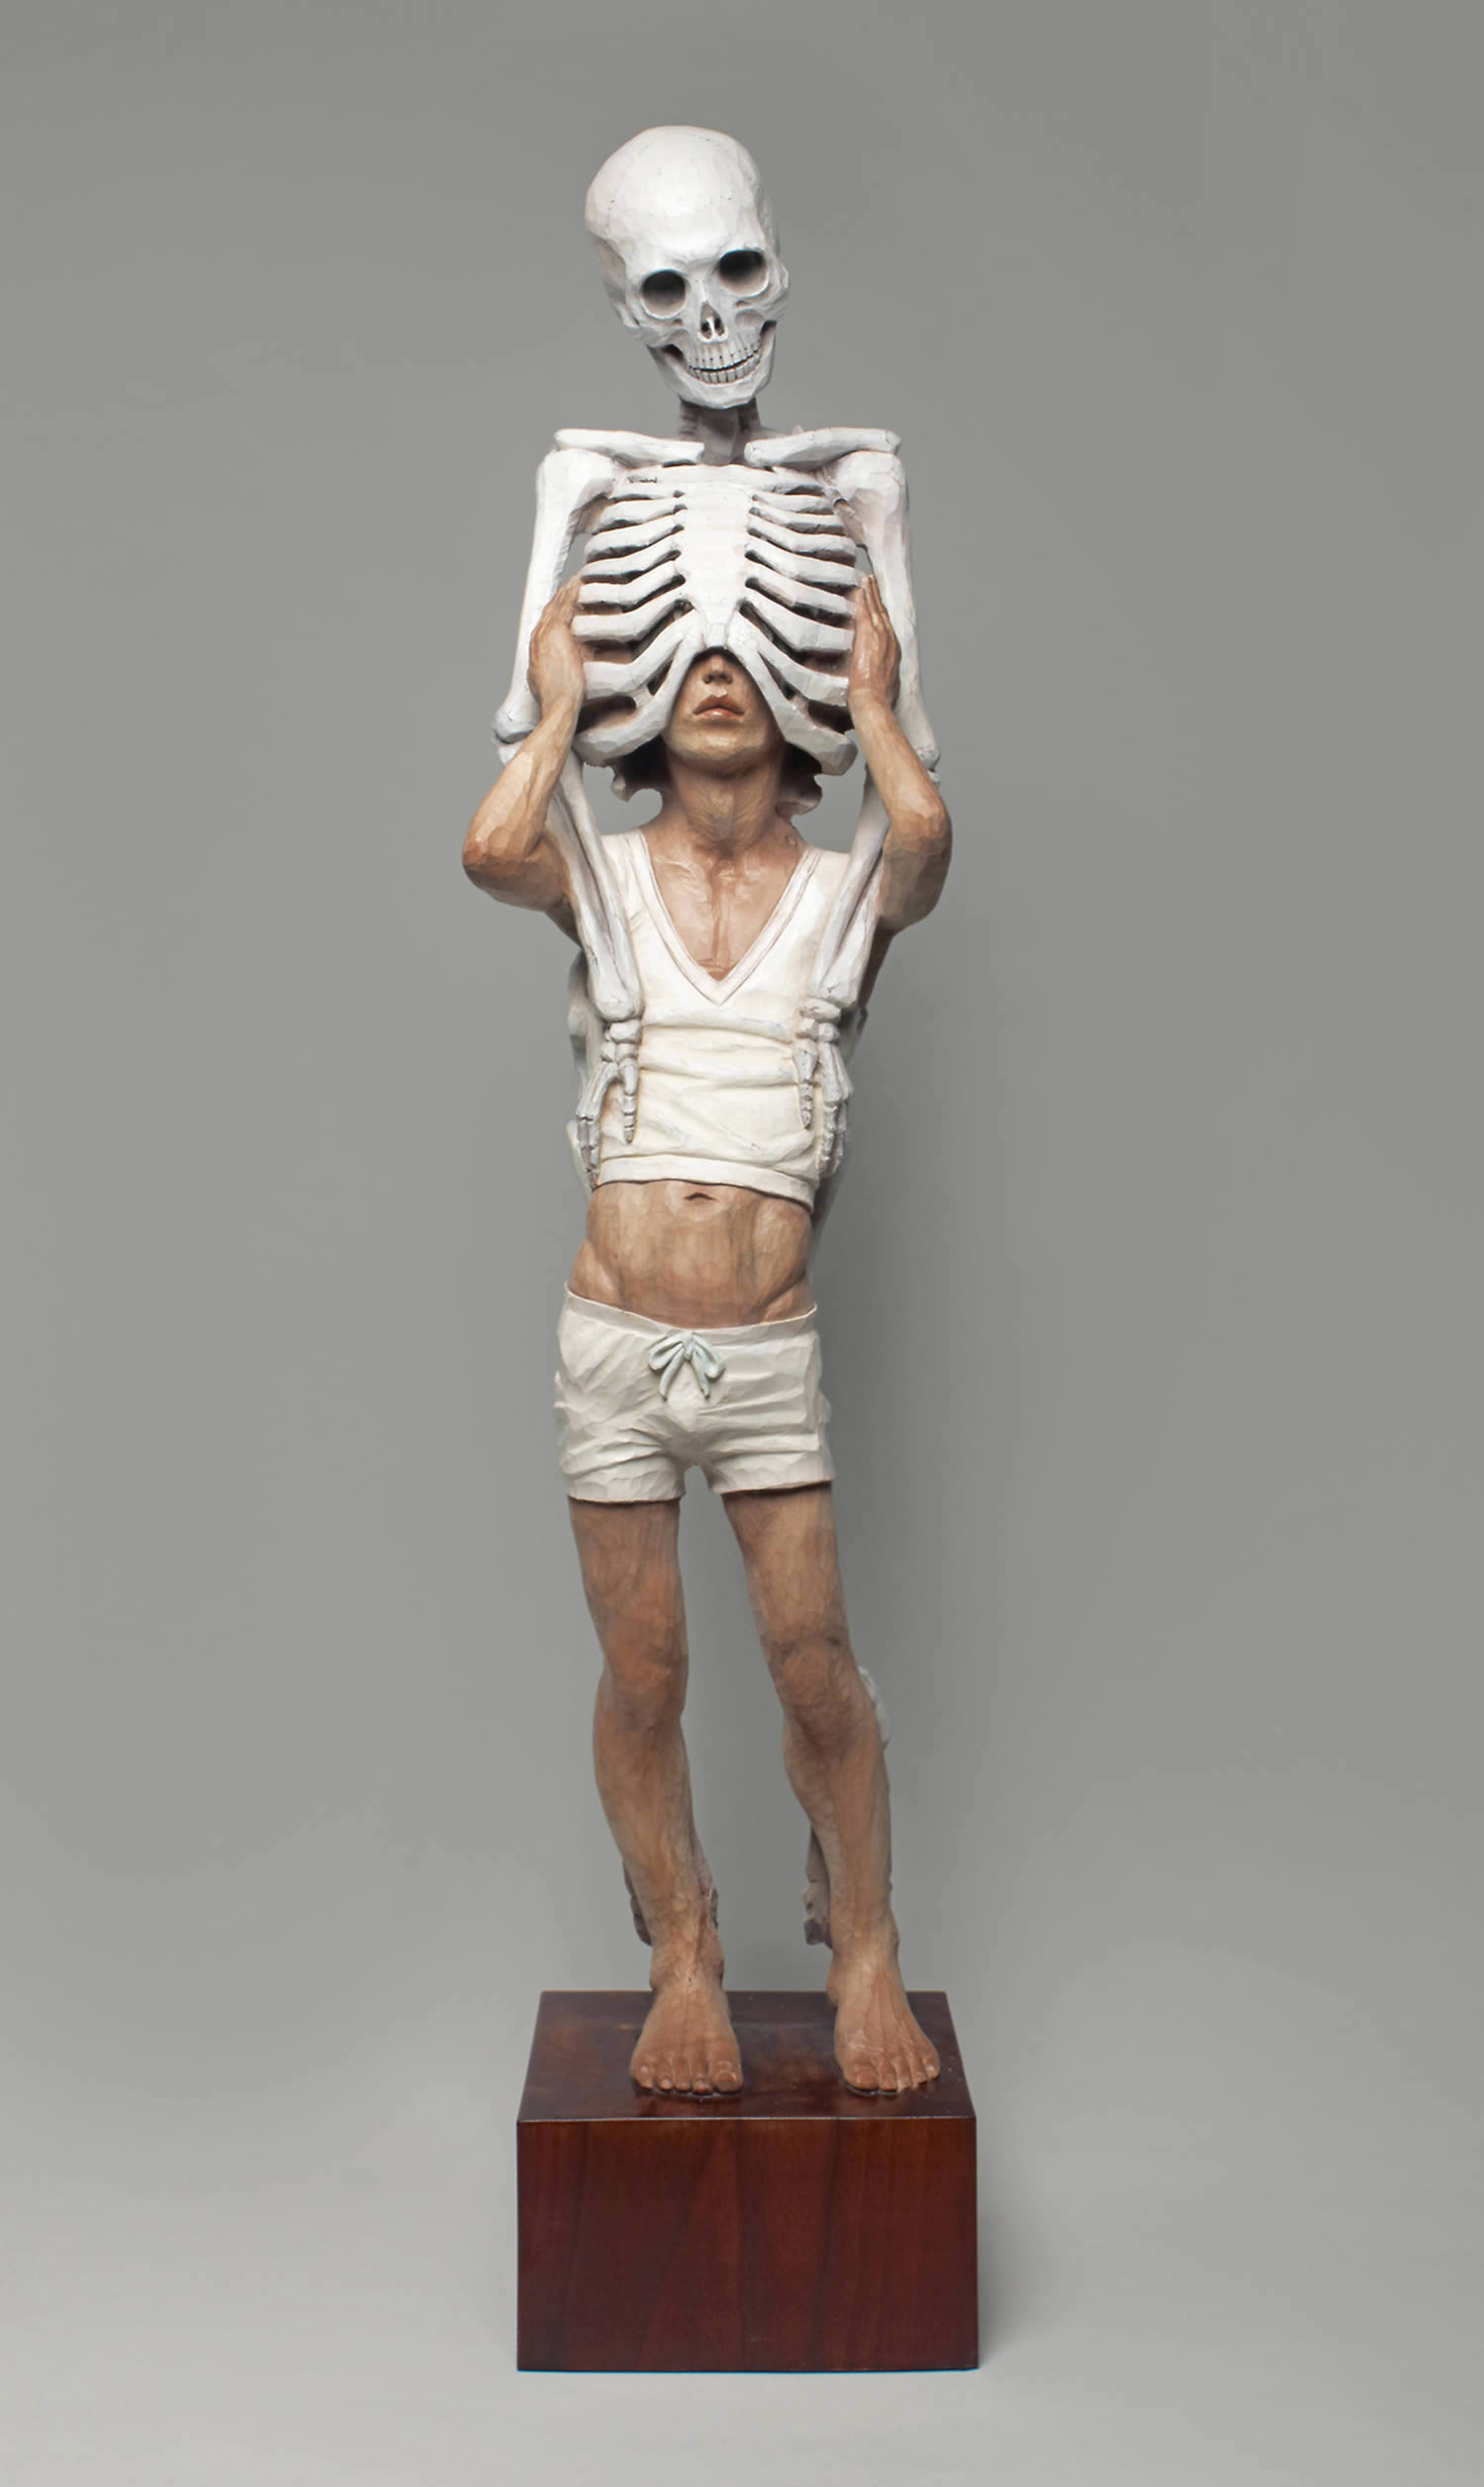 memento mori, skeleton and man sculpture by Yoshitoshi Kanemaki